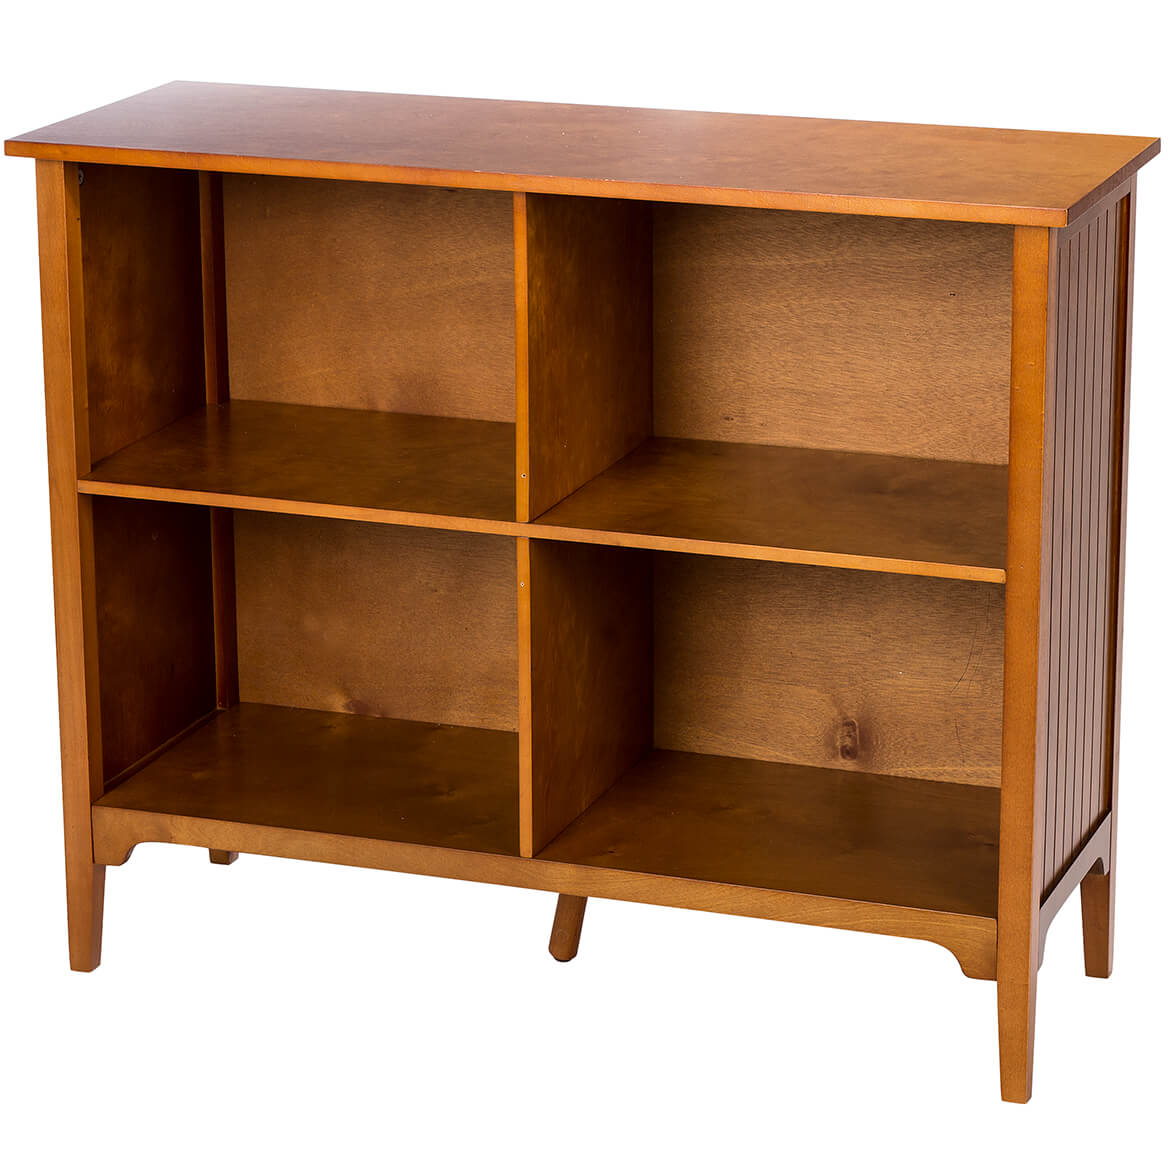 Horizontal Bookcase by OakRidgeTM - Walmart.com - Walmart.com